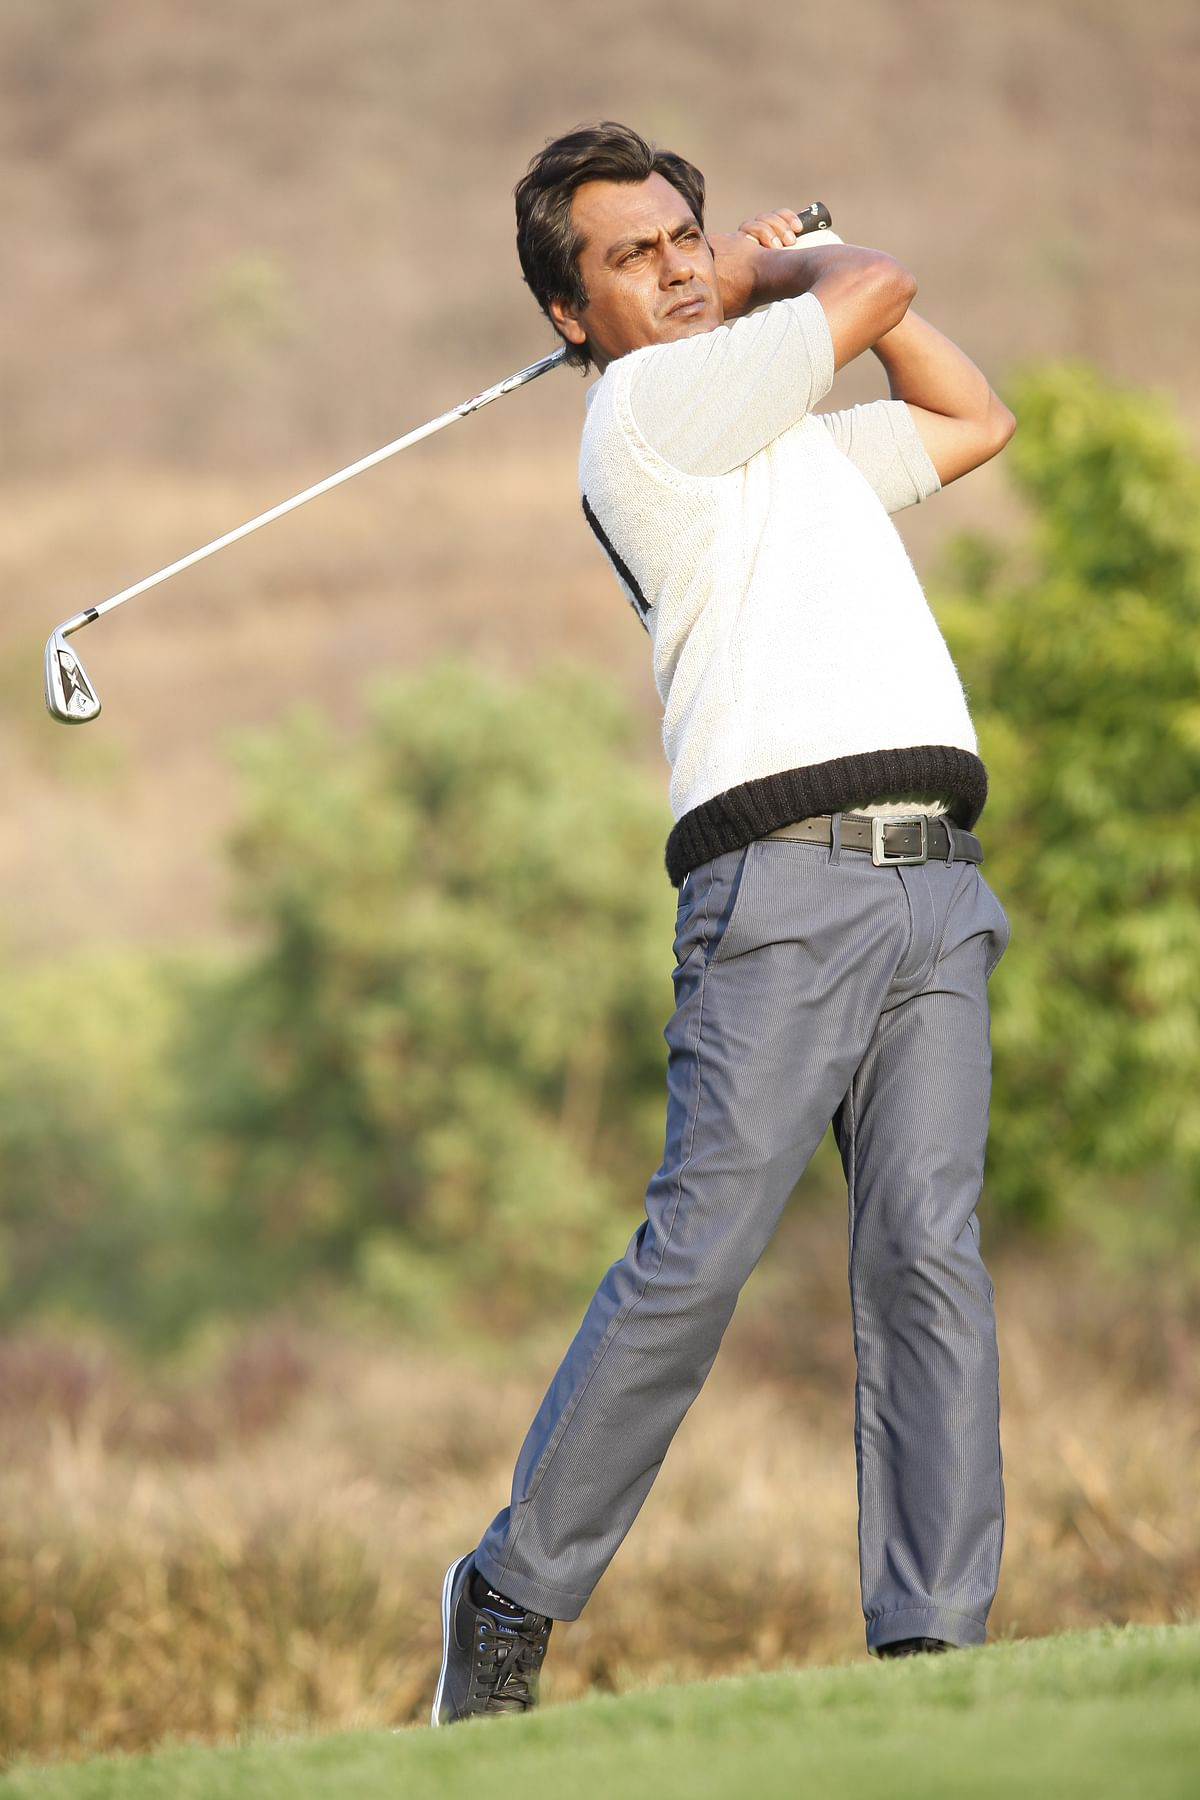 Nawazuddin Siddiqui makes for a suave golfer in<i> Freaky Ali. (</i>Photo Courtesy: Sohail Khan Productions)&nbsp;